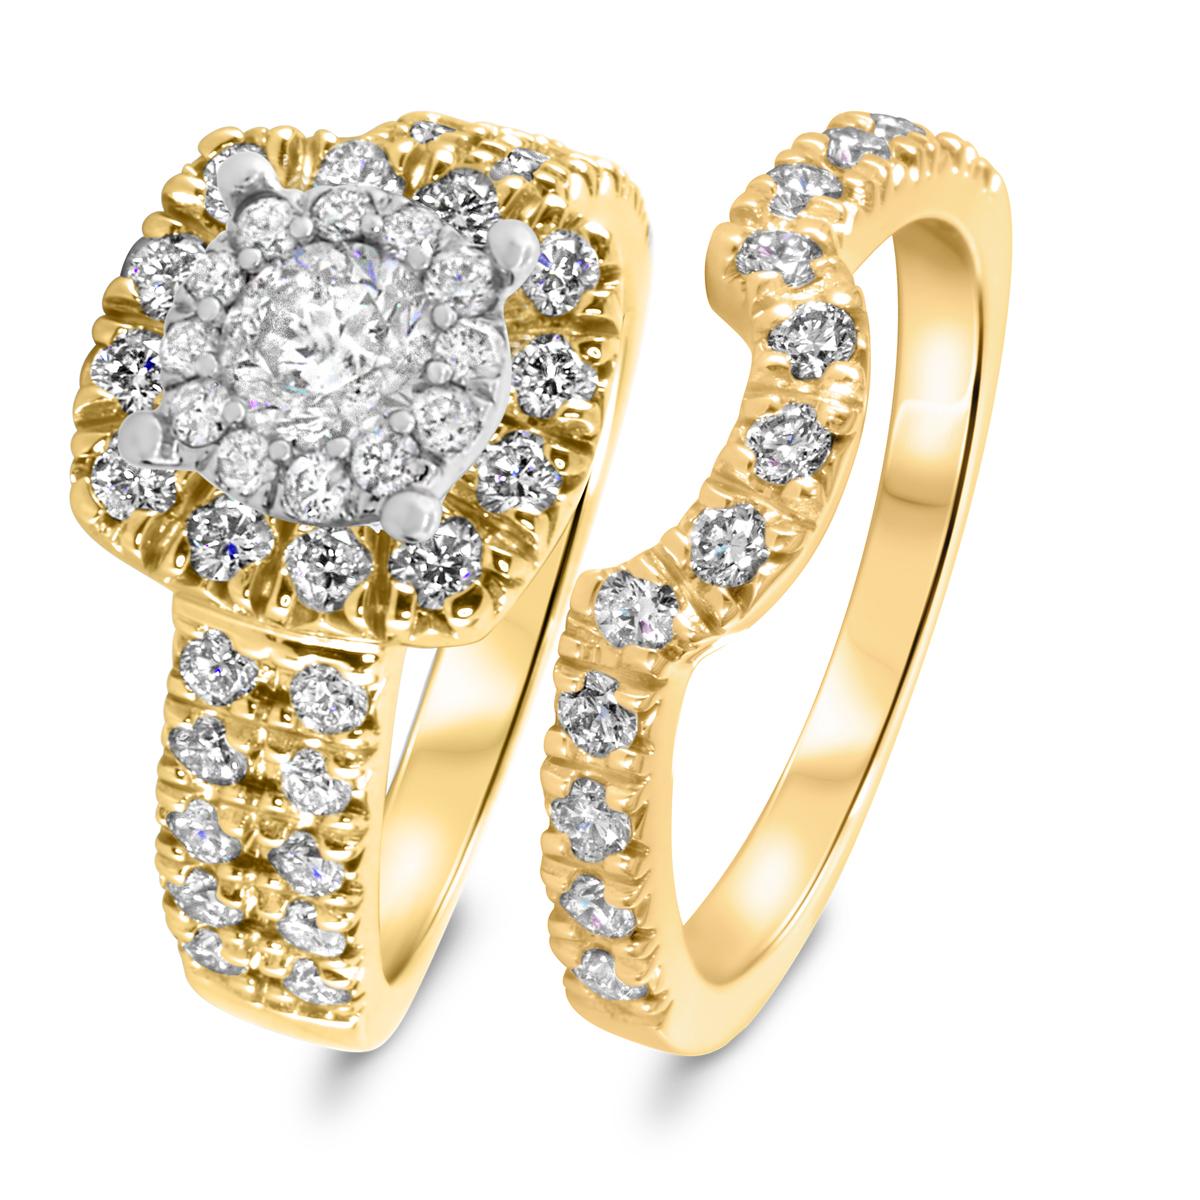 1 7/8 CT. T.W. Diamond Women's Bridal Wedding Ring Set 10K Yellow Gold